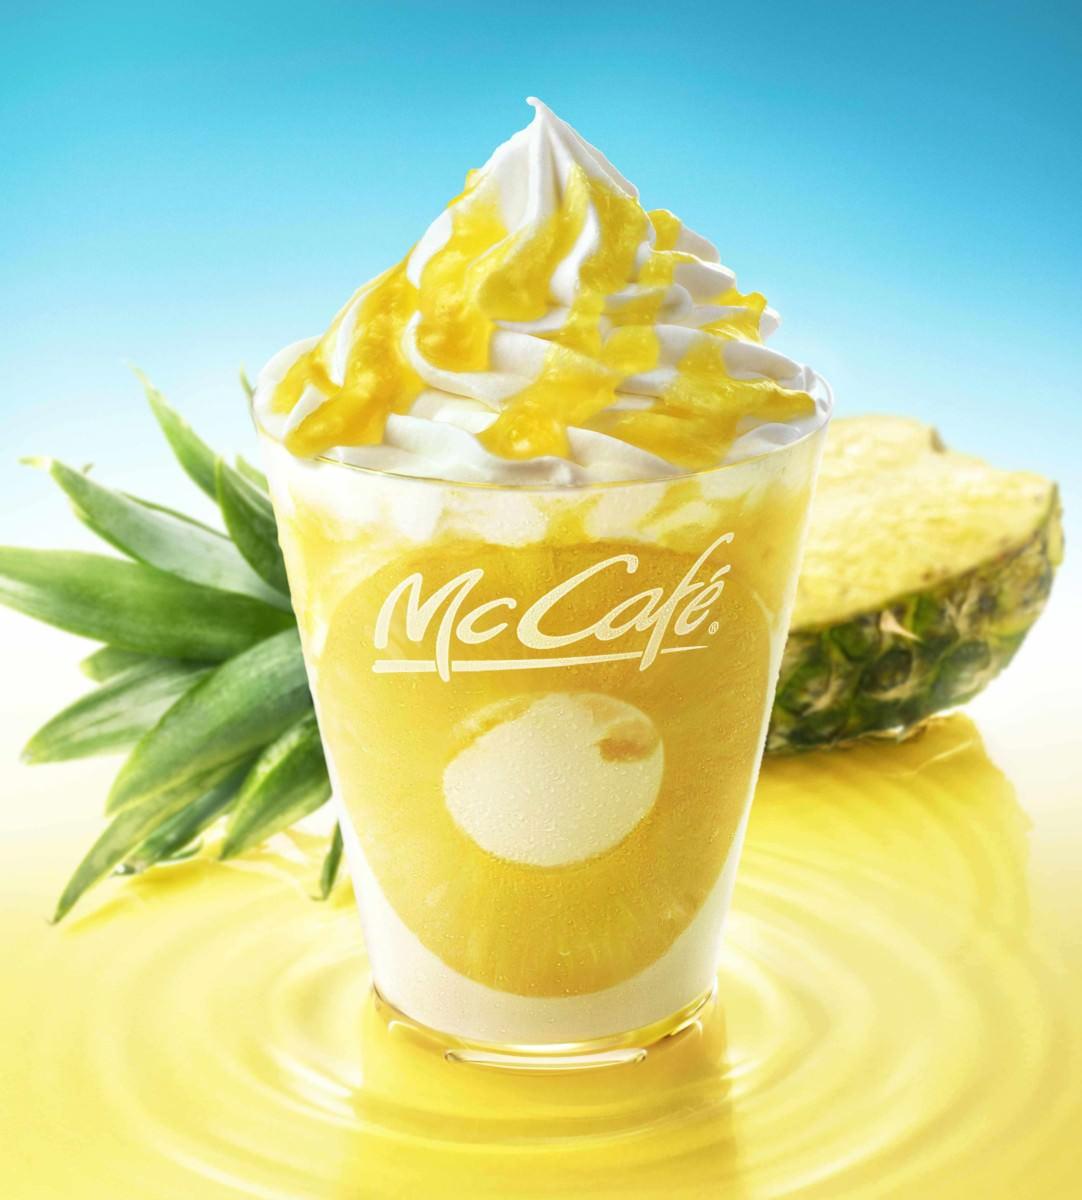 McCafe by Barista メイン